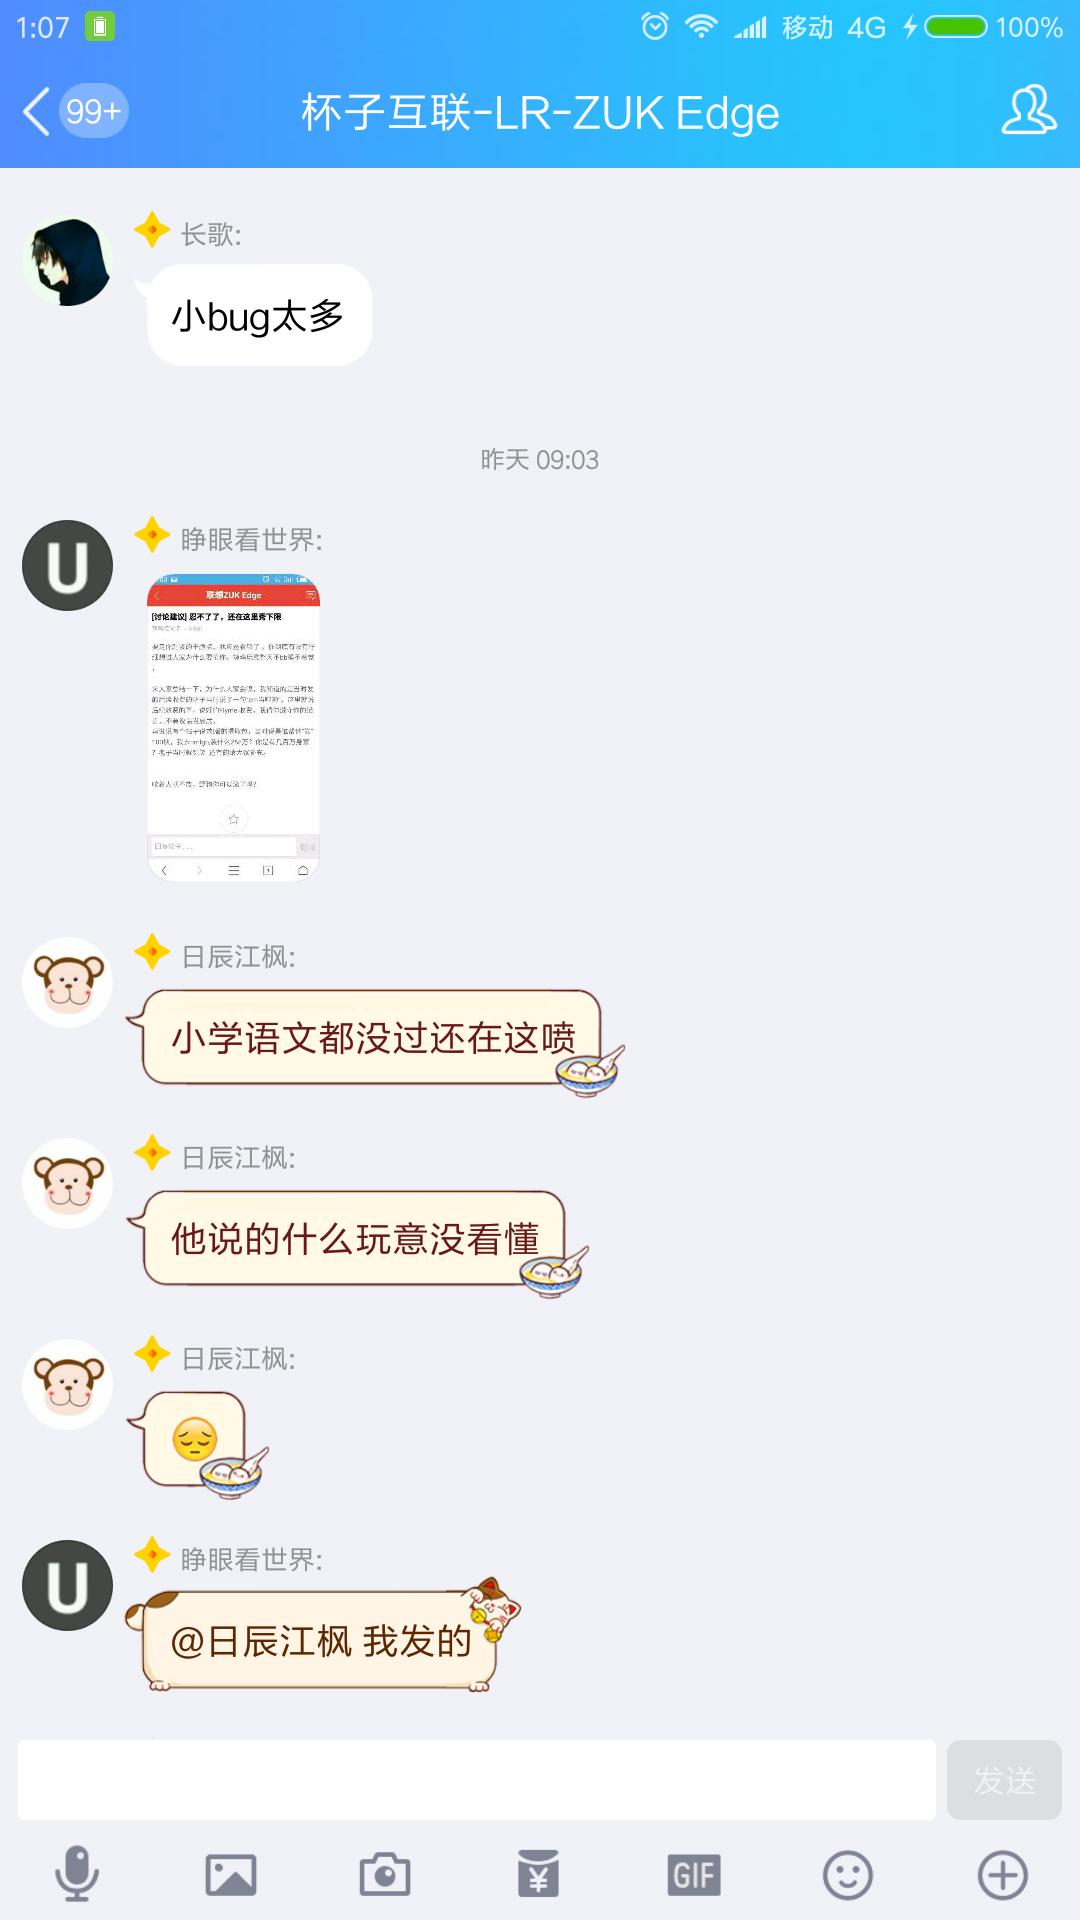 Screenshot_2017-07-09-01-07-14-734_com.tencent.mobileqq.png